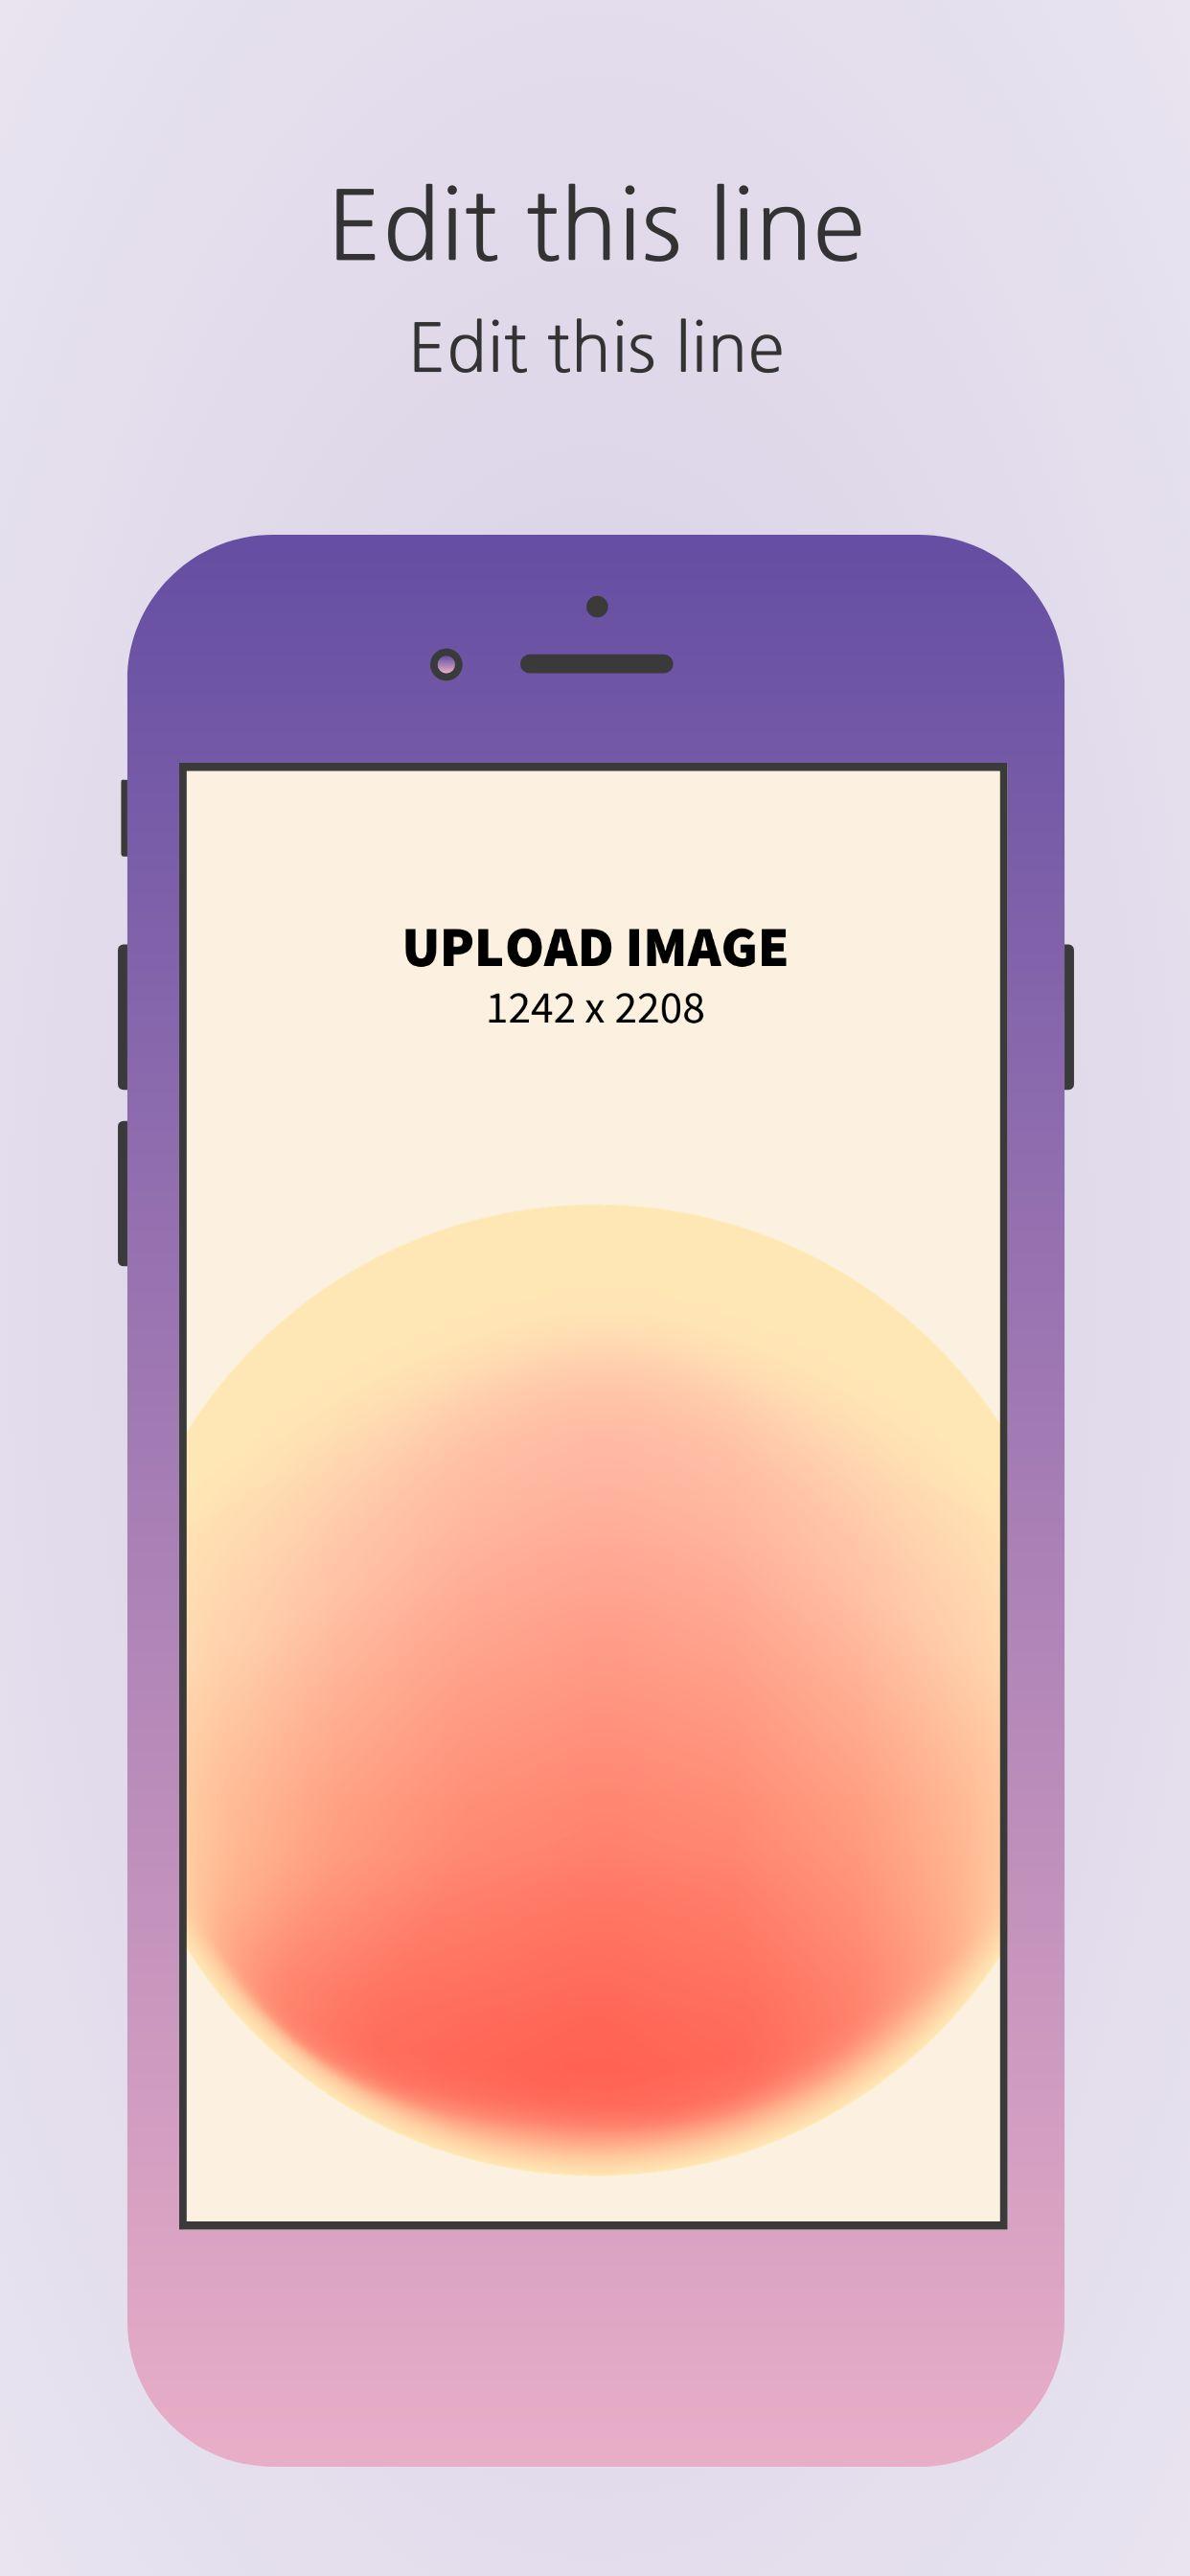 iPhone 6 Plus Screenshot 6  Free  Easy To Use